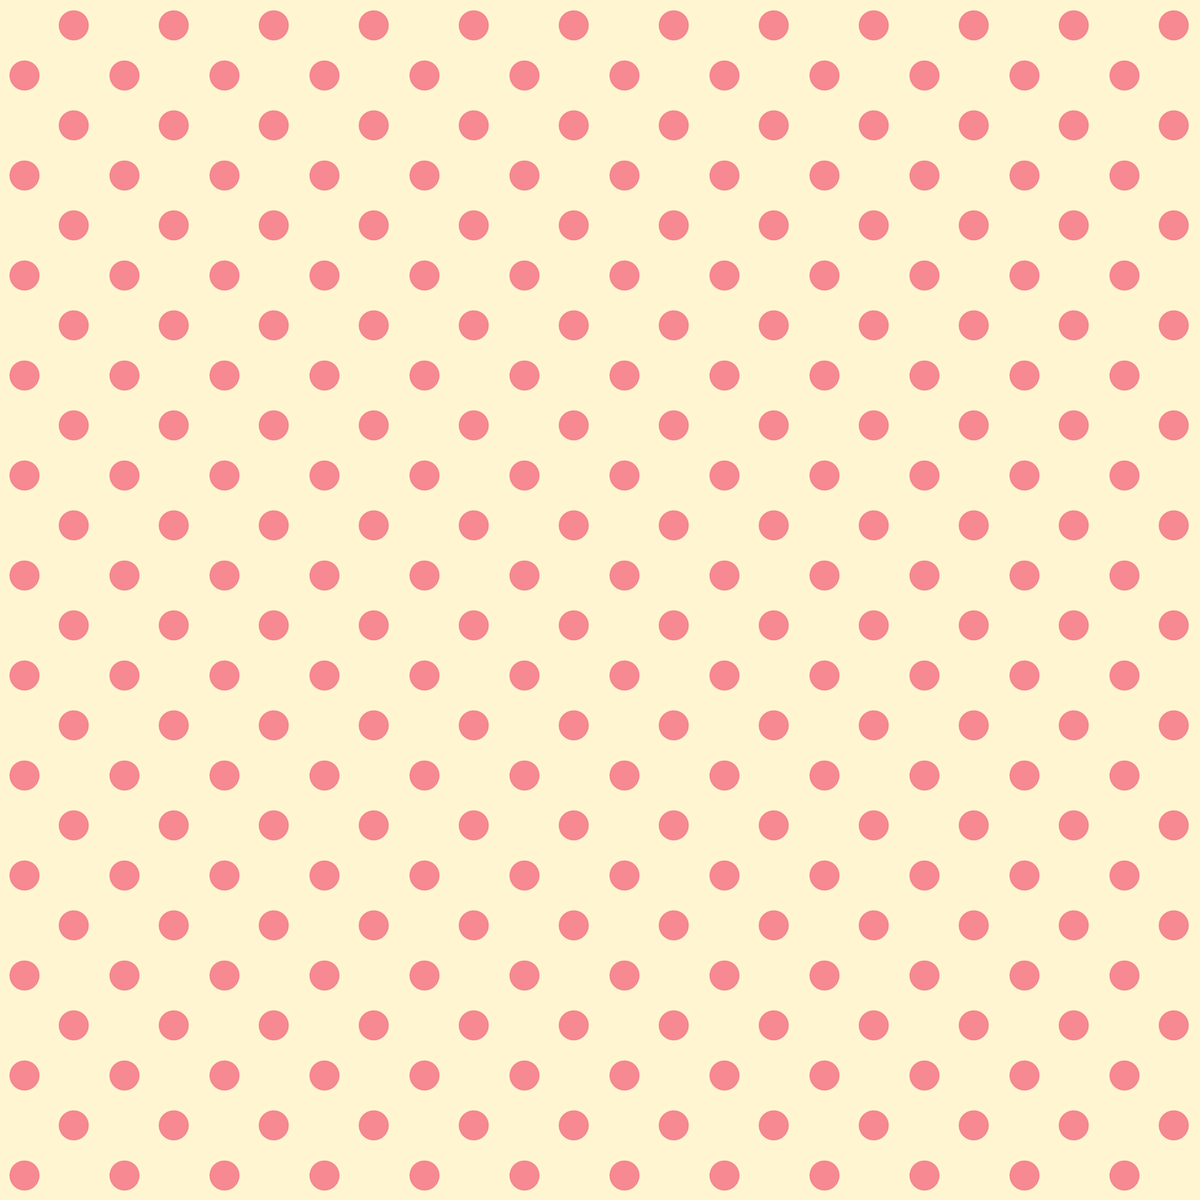 6 Images of Free Printable Polka Dot Scrapbook Paper